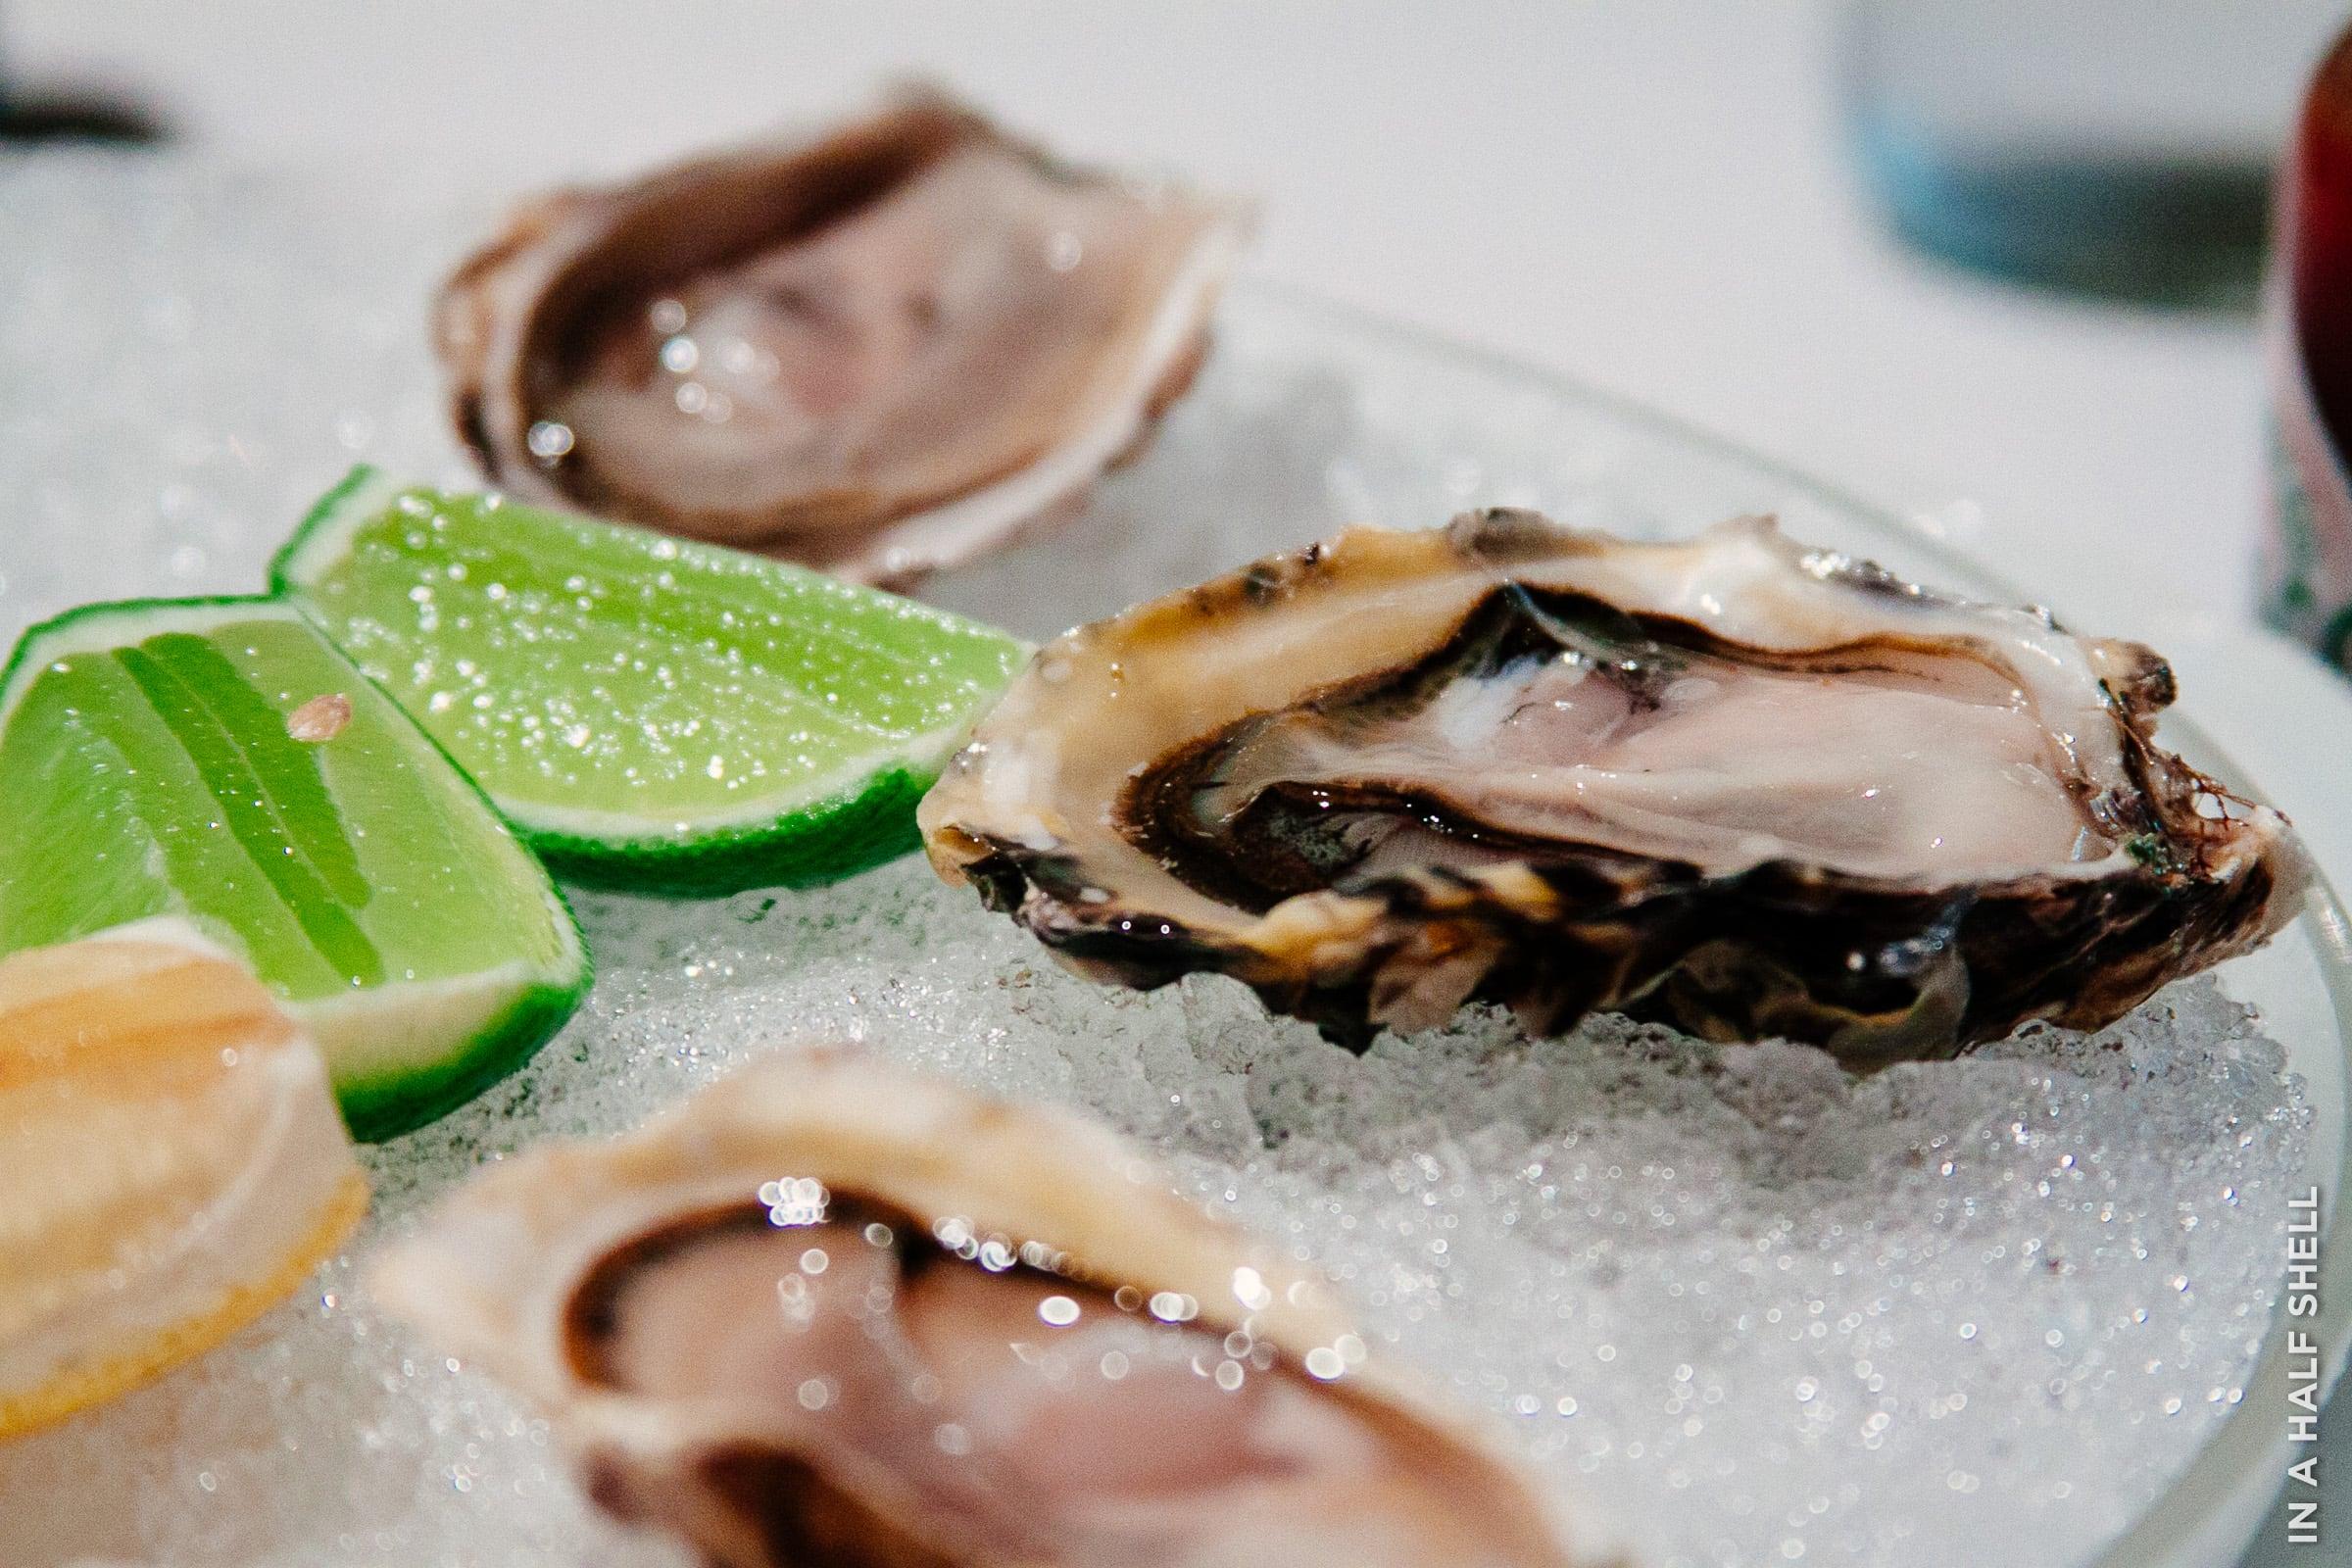 Santa Catarina oysters in Rio de Janeiro, Brazil